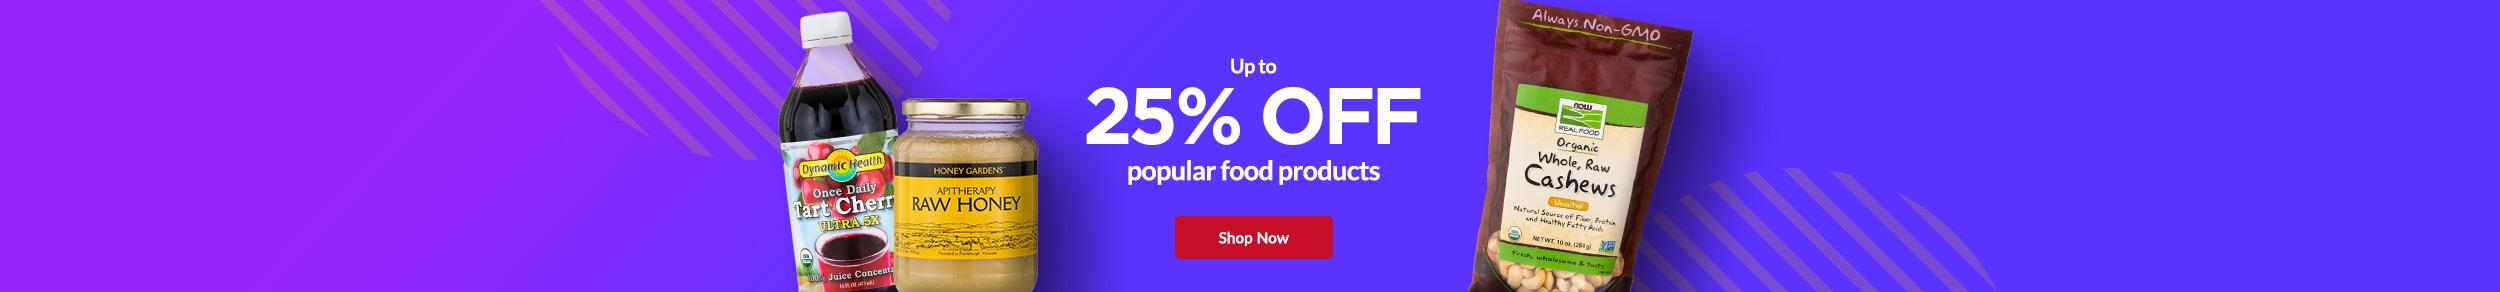 https://i3.pureformulas.net/images/static/cyber_store_slides_nov2020_food.jpg